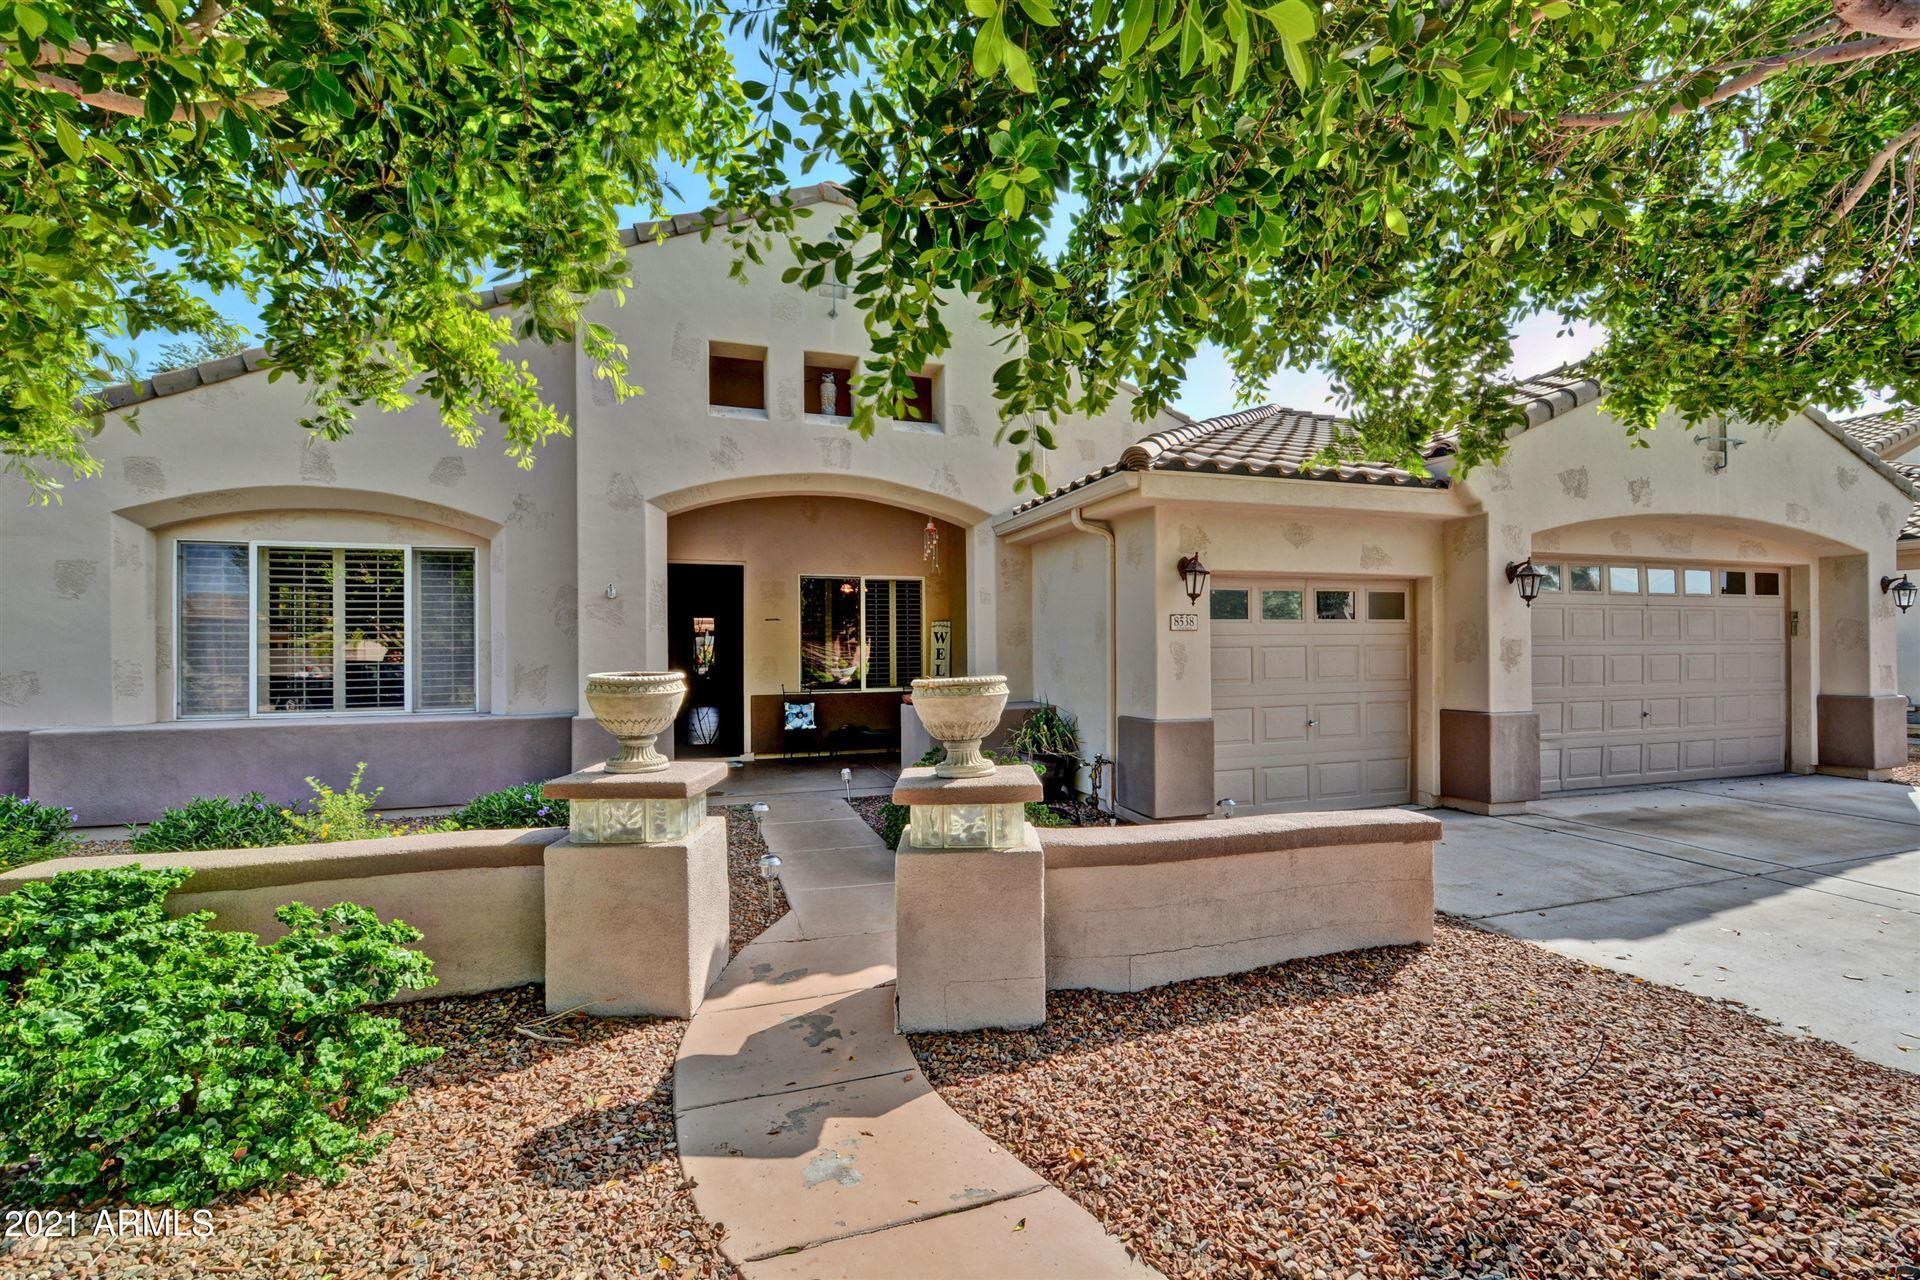 8538 W IRMA Lane, Peoria, AZ 85382 - MLS#: 6266984